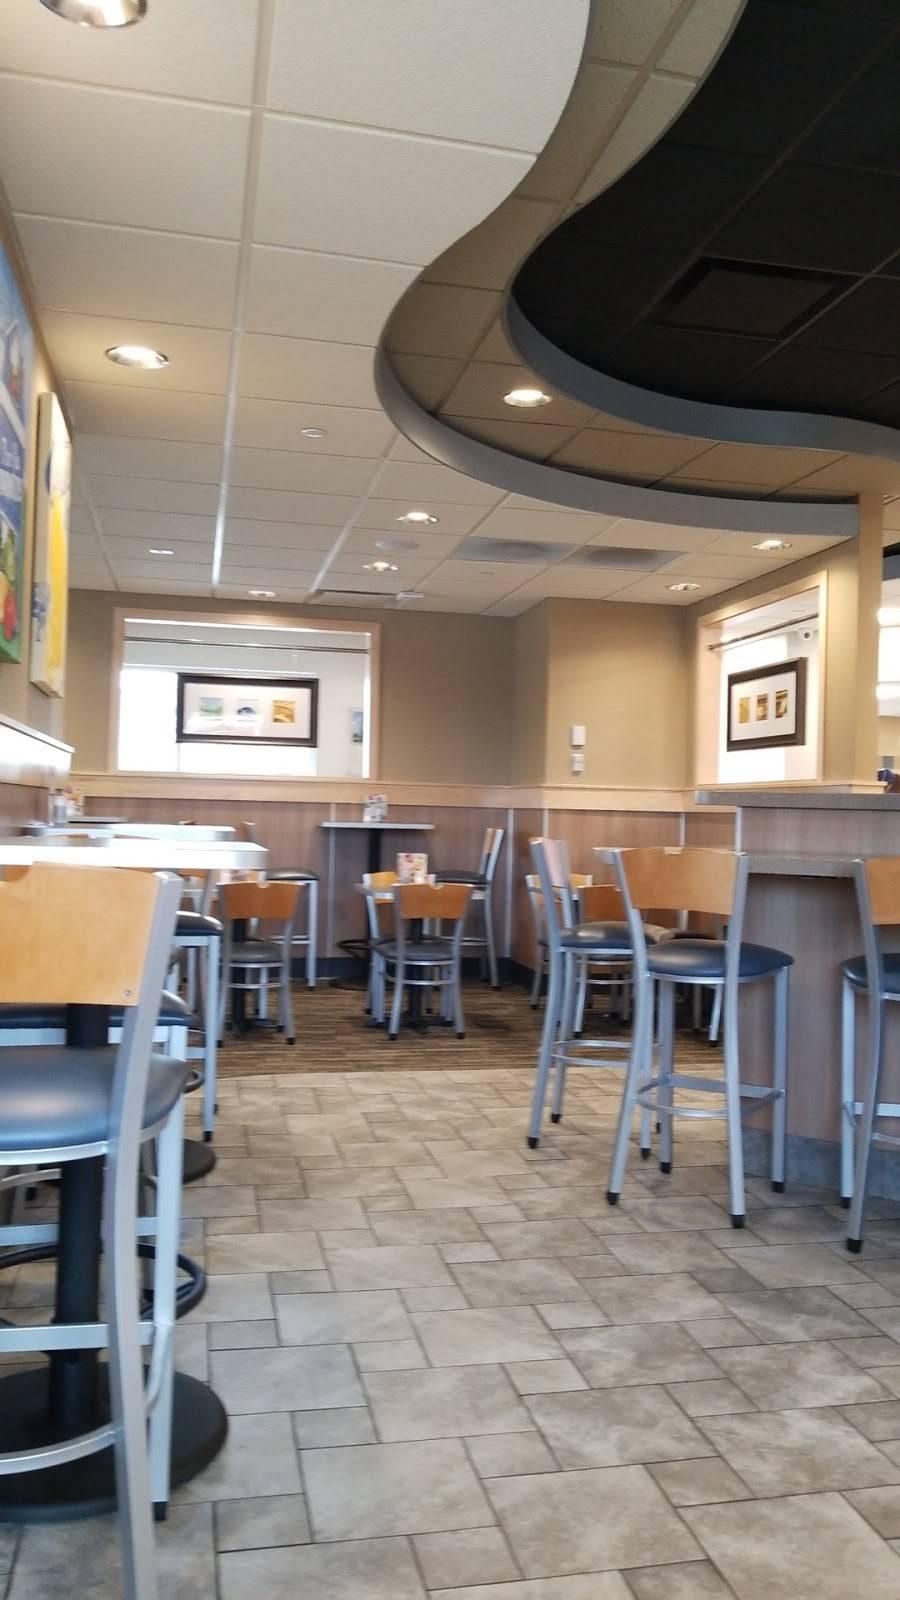 Culvers | restaurant | 1451 34th St N, St. Petersburg, FL 33713, USA | 7278005321 OR +1 727-800-5321